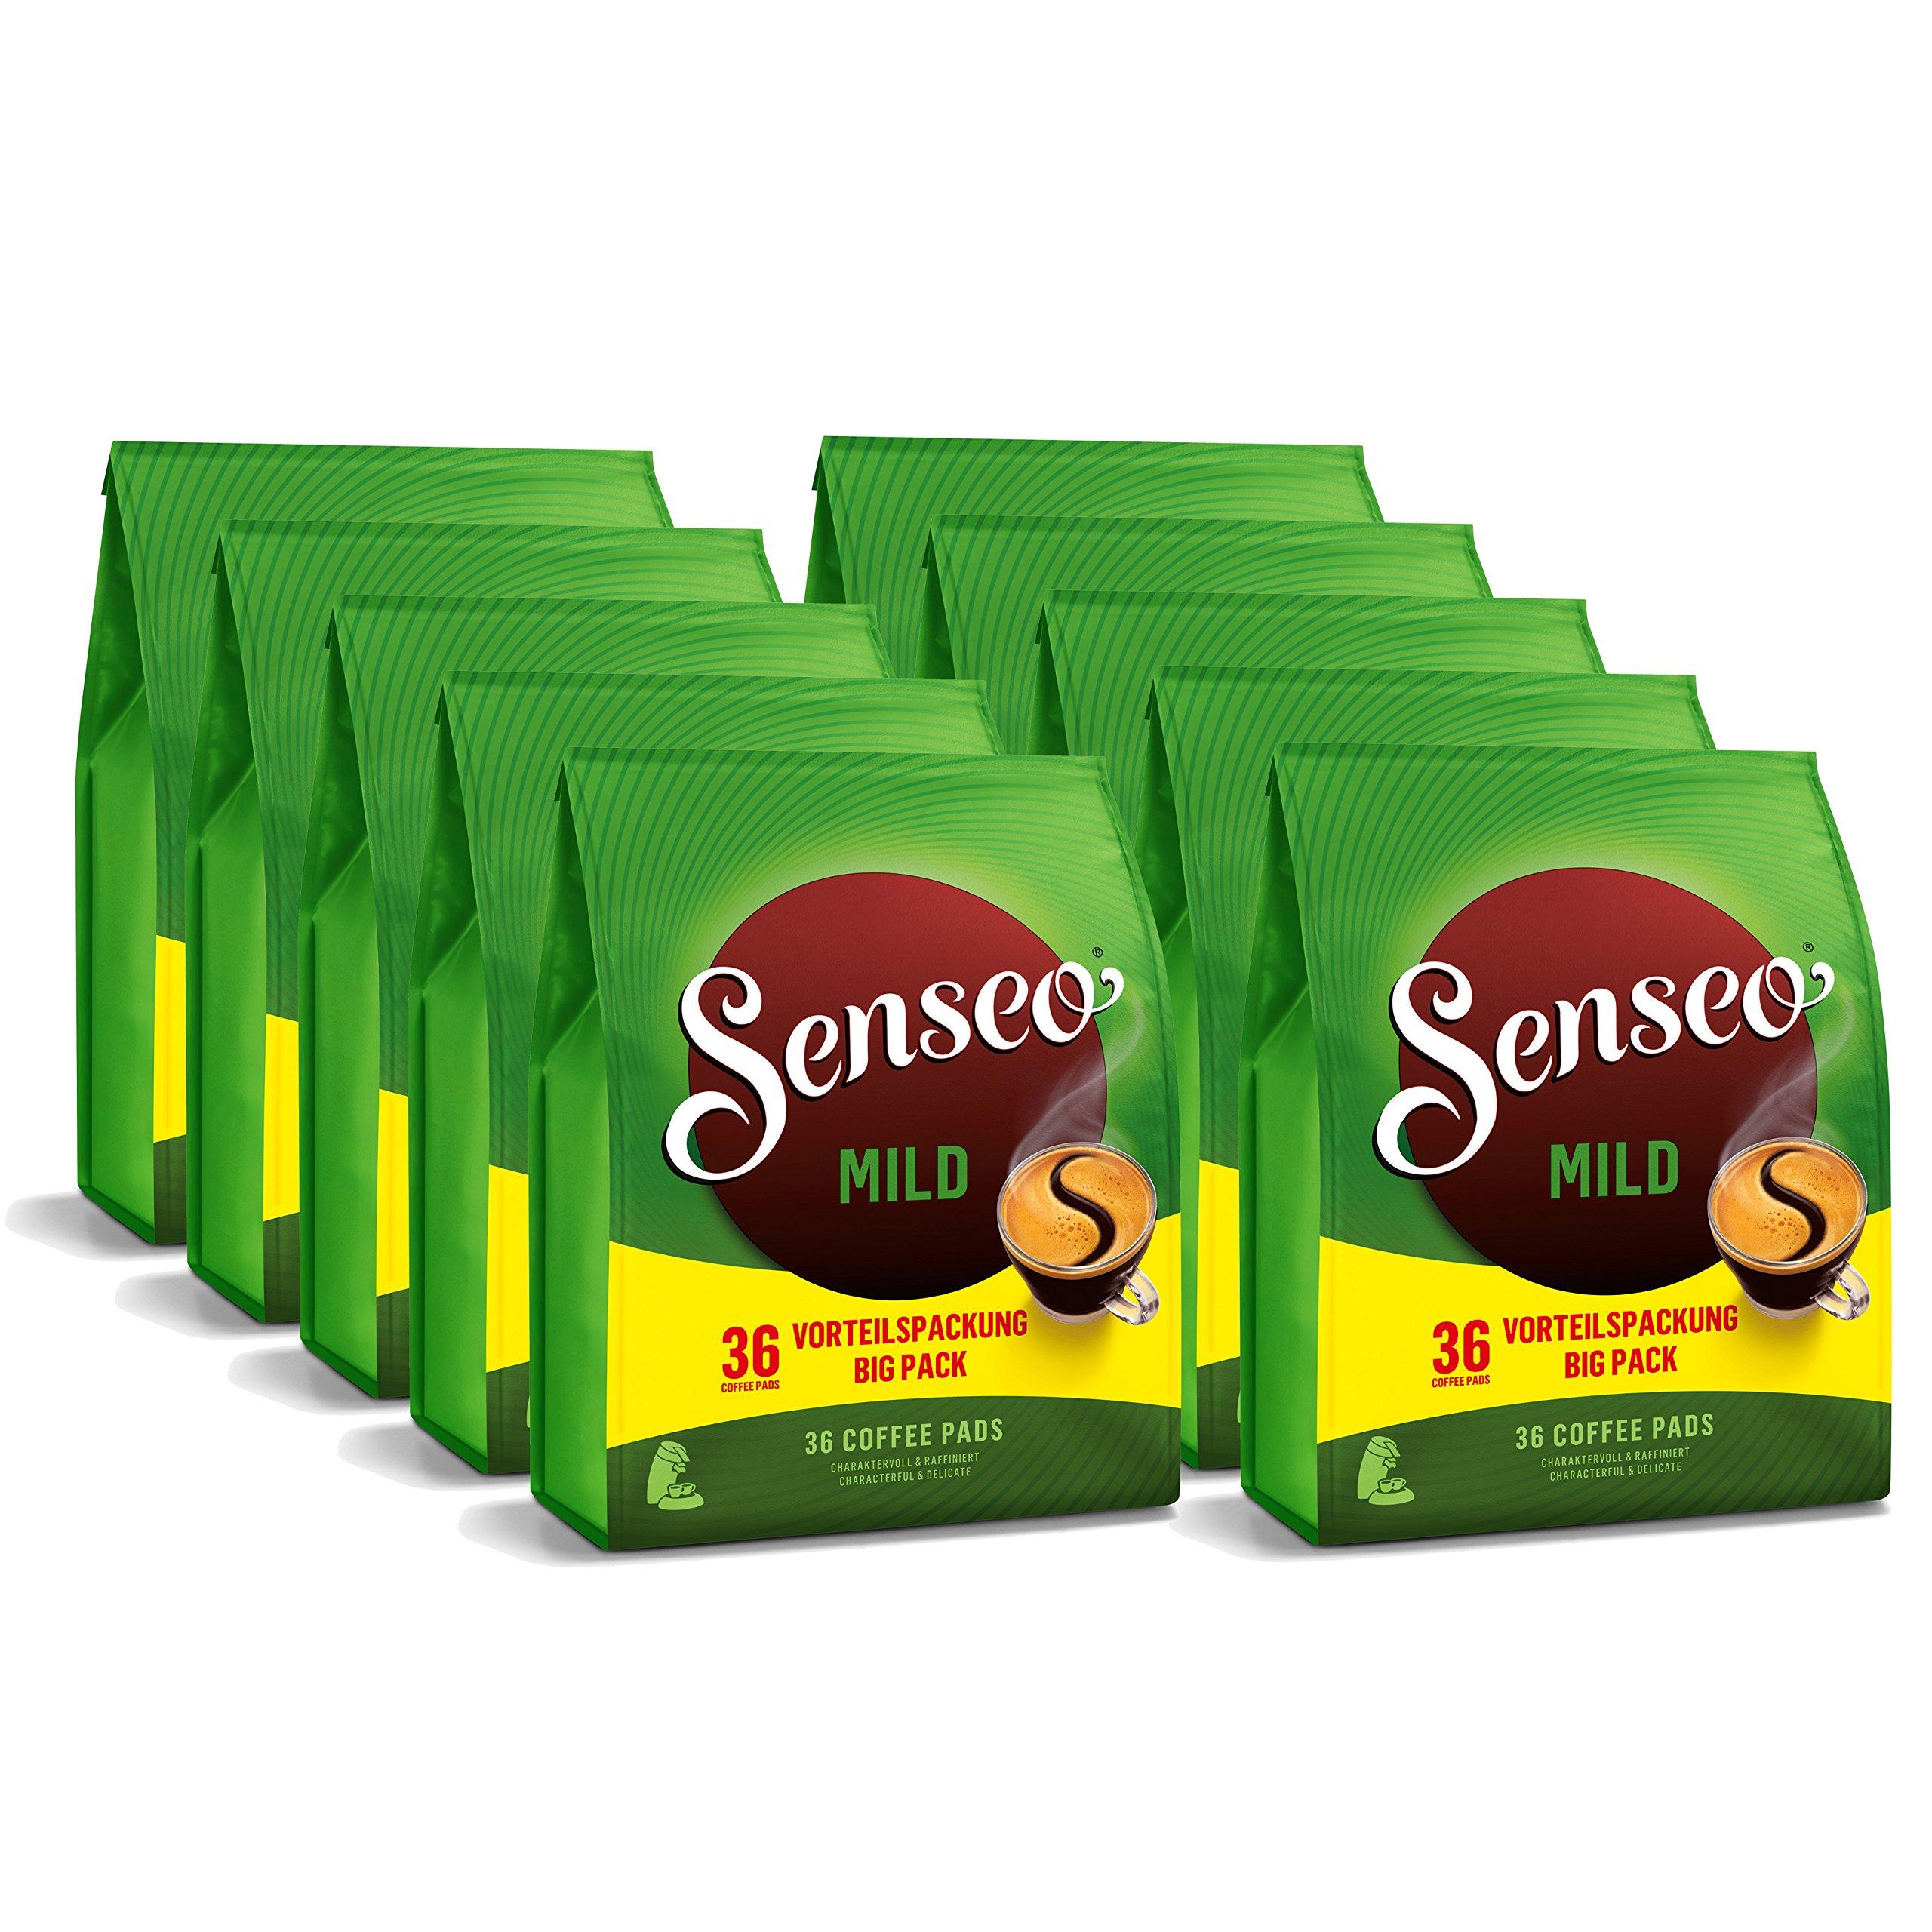 Senseo Mild Roast Coffee, 360-count Pods (10 Bags of 36 Pods)